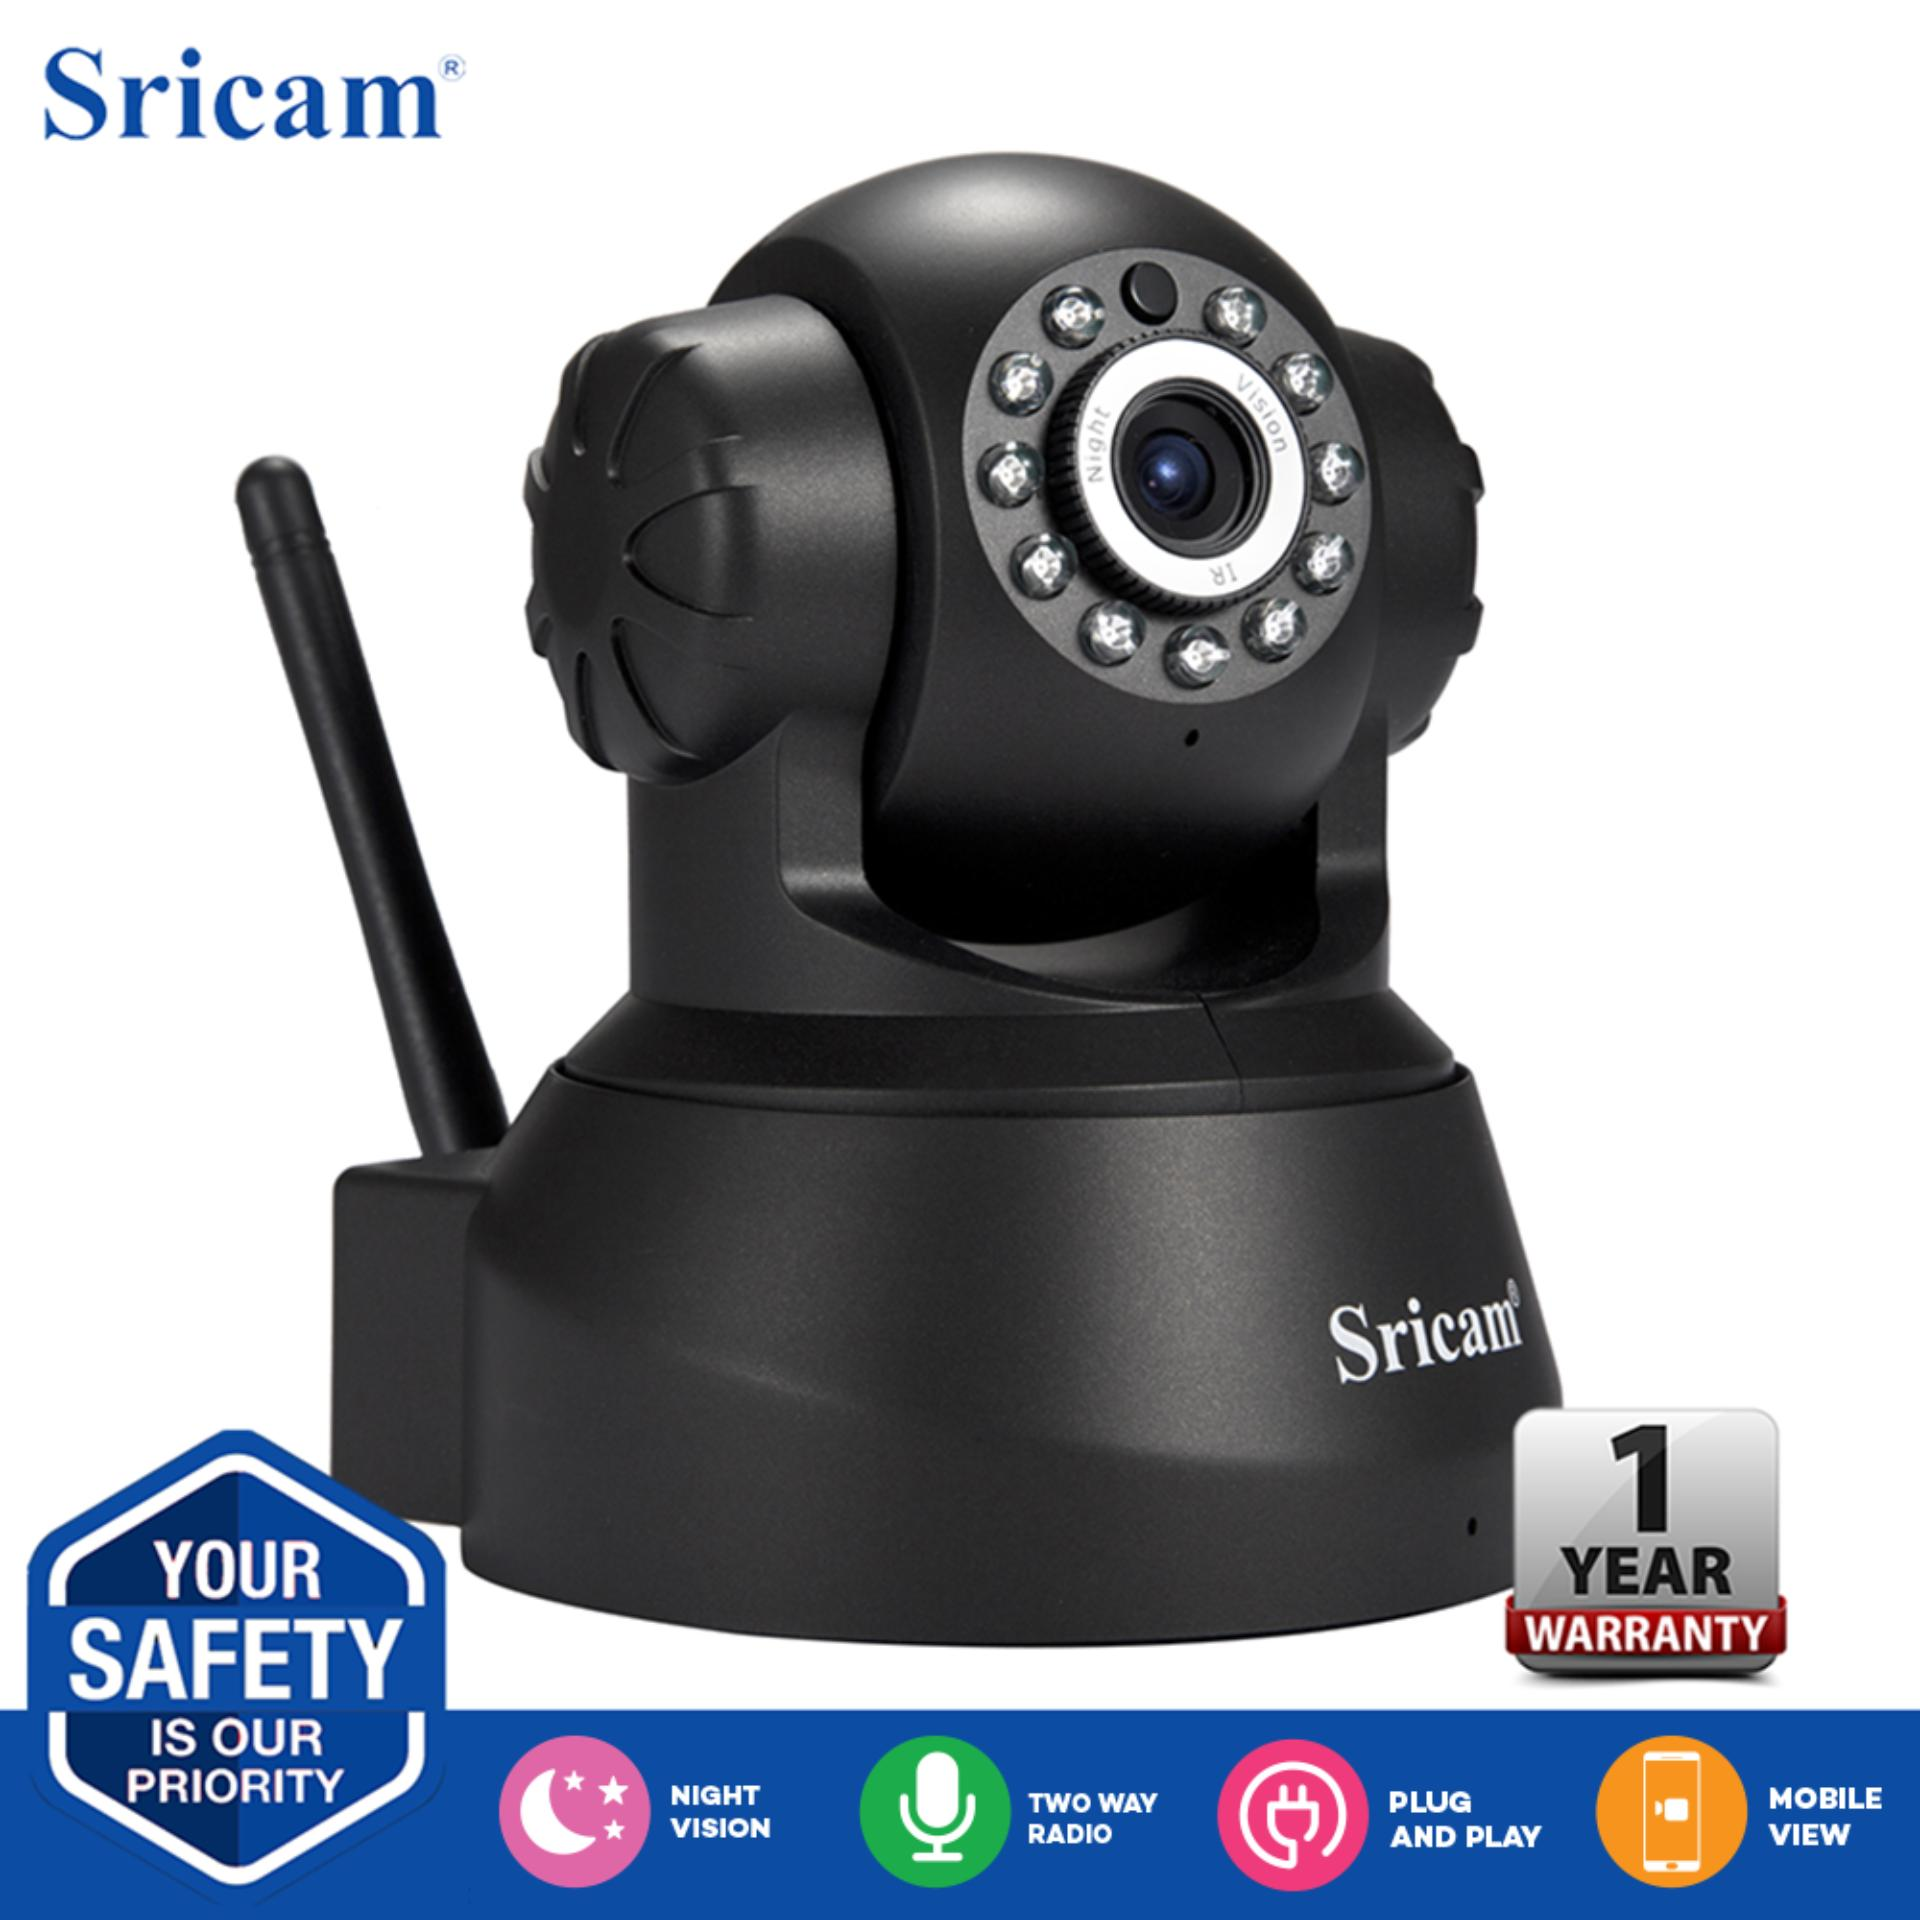 Sricam SP012 Wifi CCTV w/ Pan Tilt & Motion Detection Alarm Camera